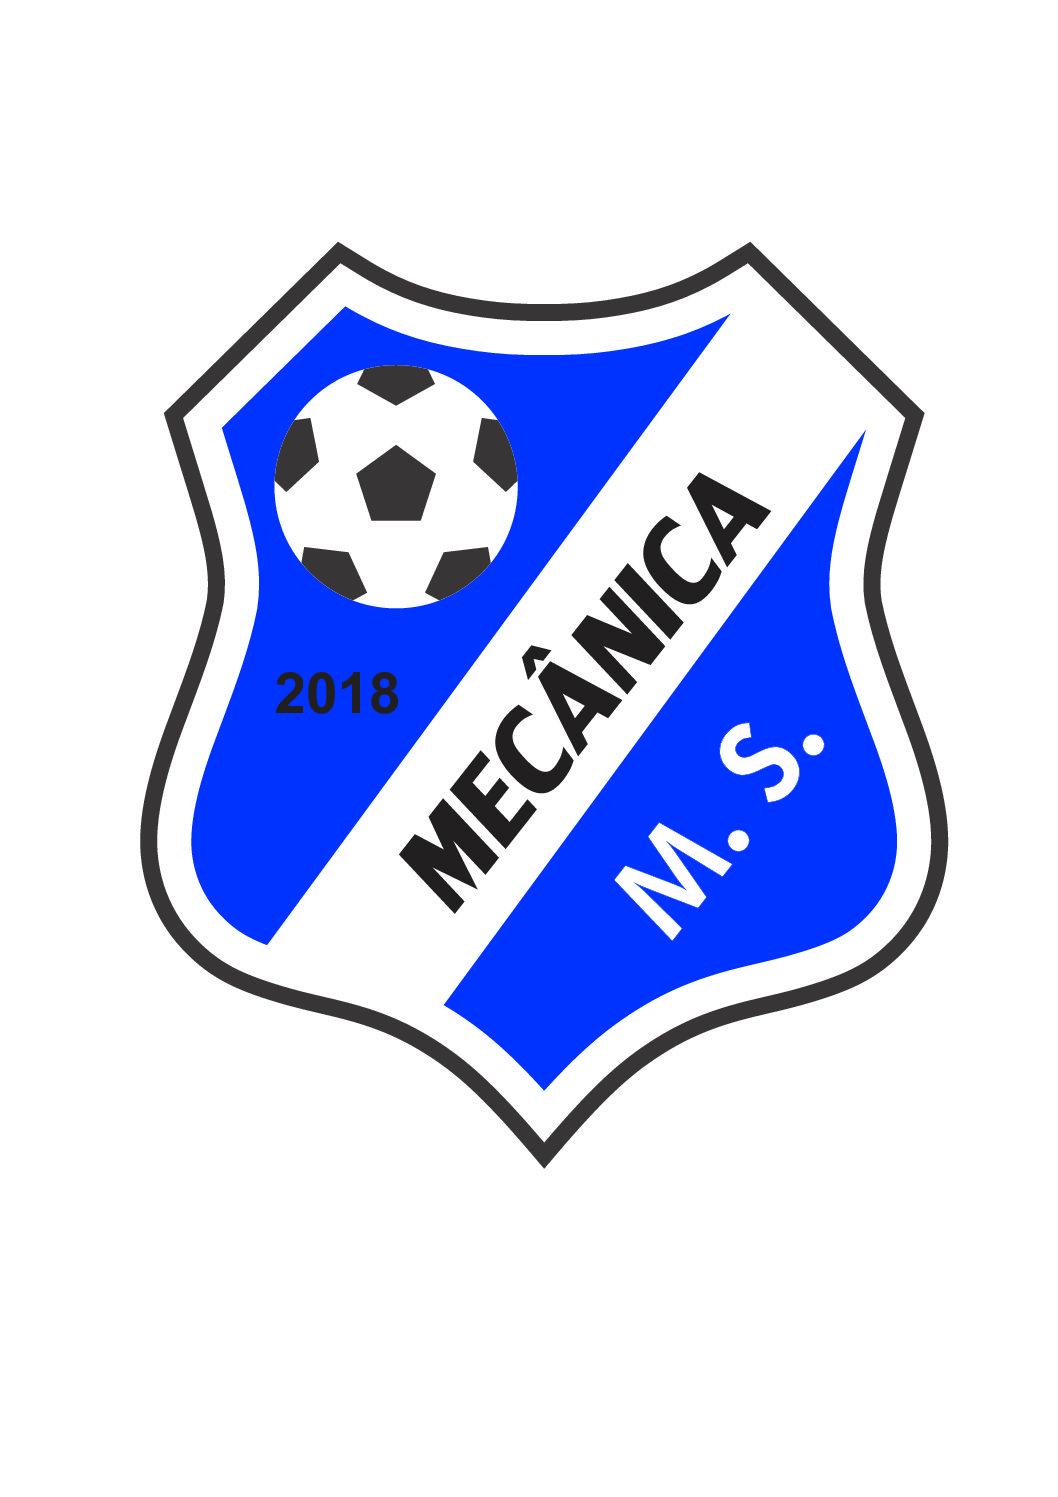 FARDAMENTO PARA EQUIPE DO M.S MECÂNICA DE IBIRUBÁ/RS.